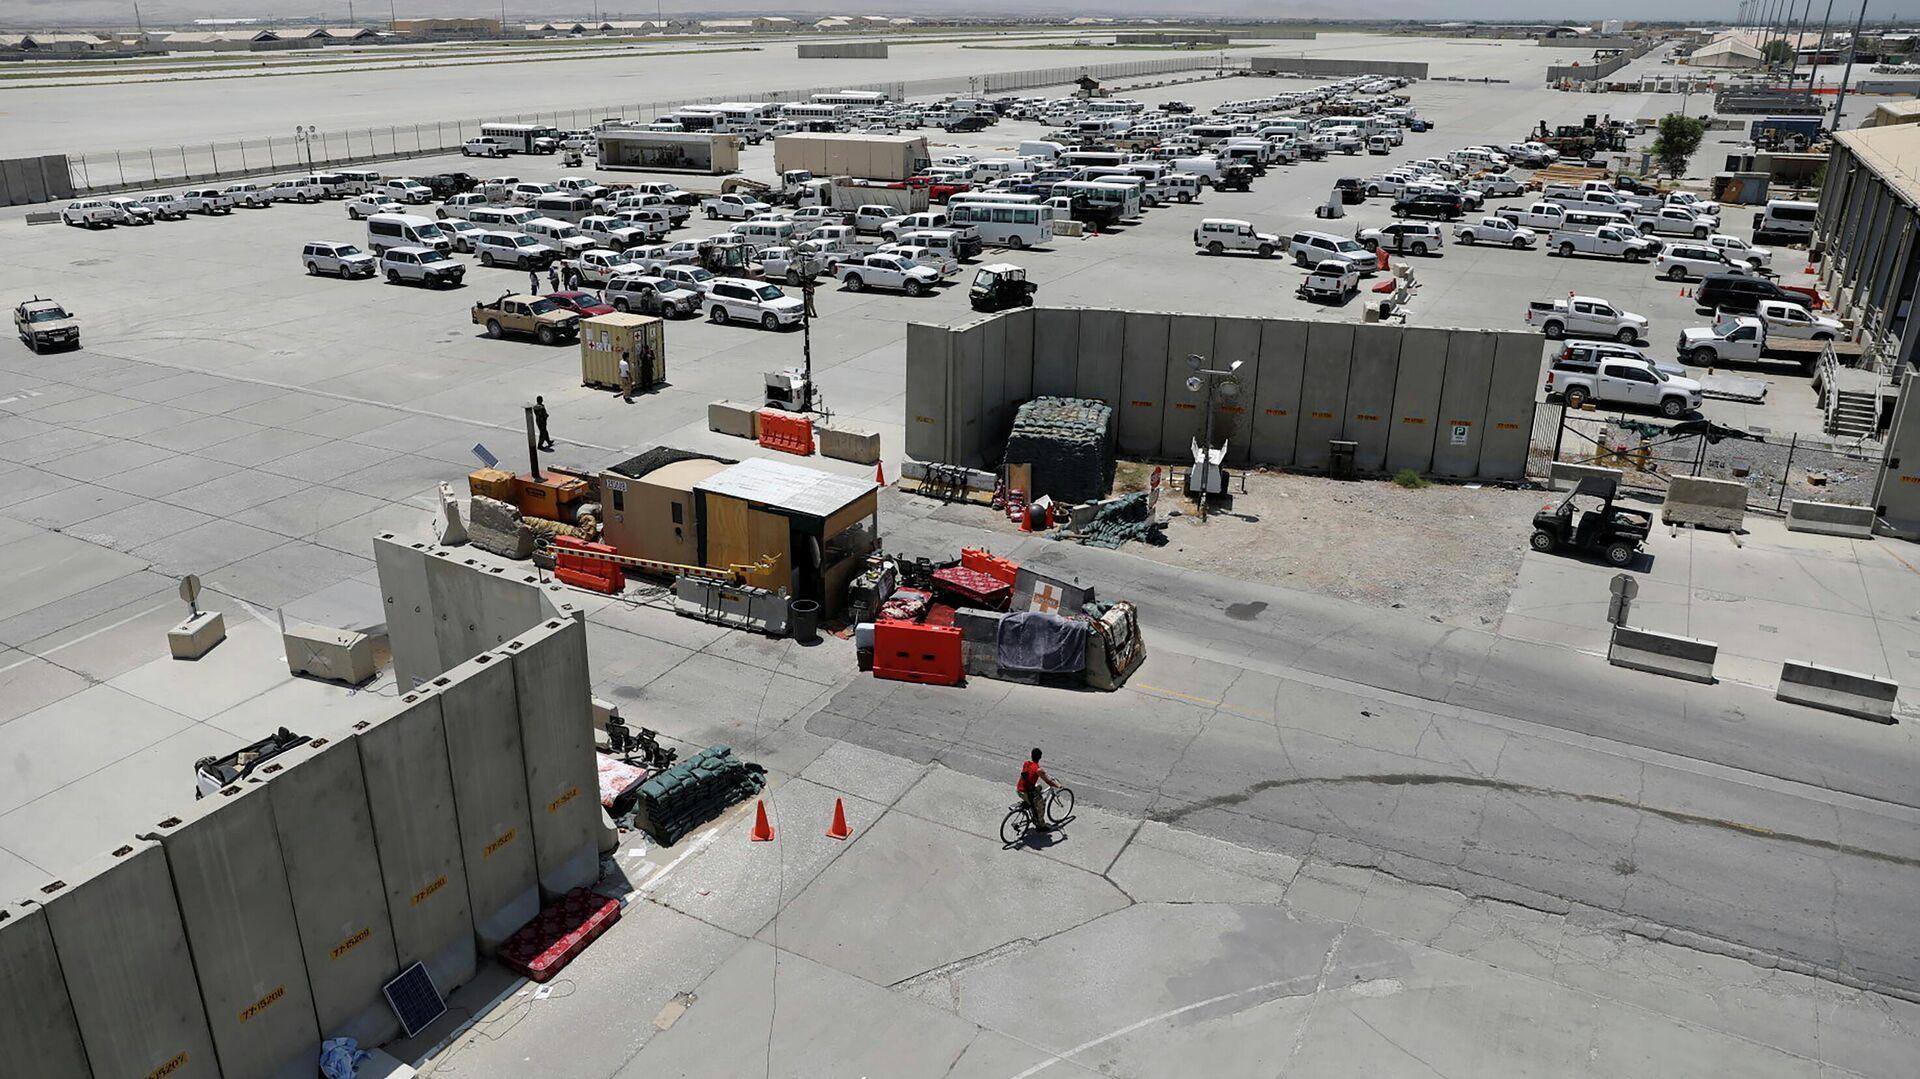 Der afghanische Luftstützpunkt Bagram nach Abzug der US-Truppen, 5. Juli 2021 - SNA, 1920, 05.07.2021